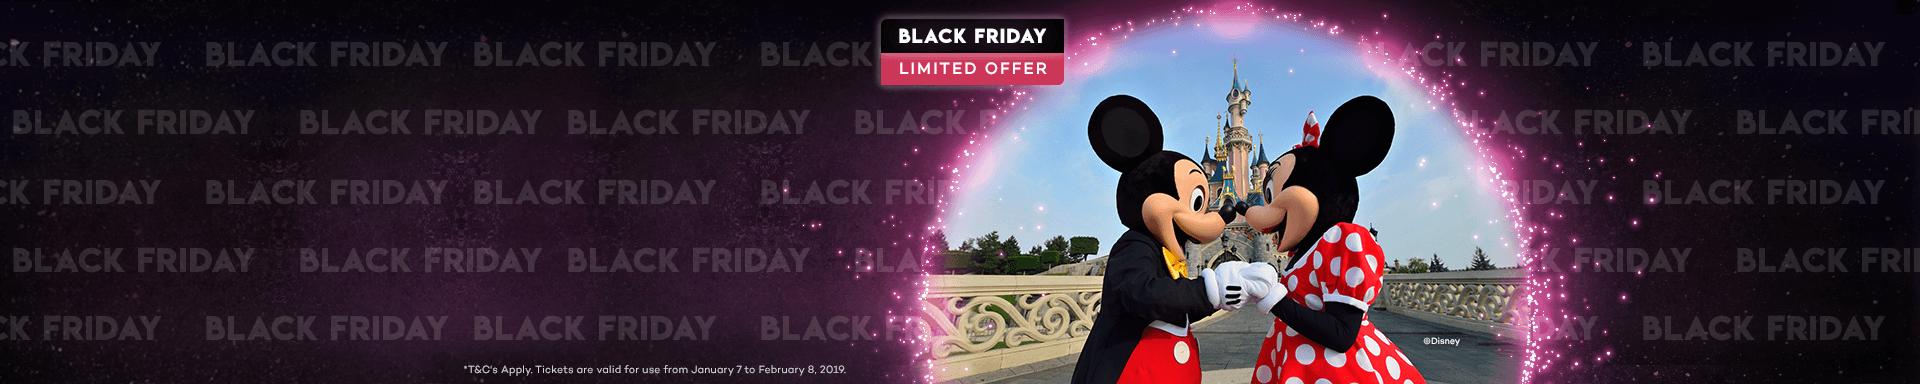 Black Friday Limited Offer -  Disneyland Paris